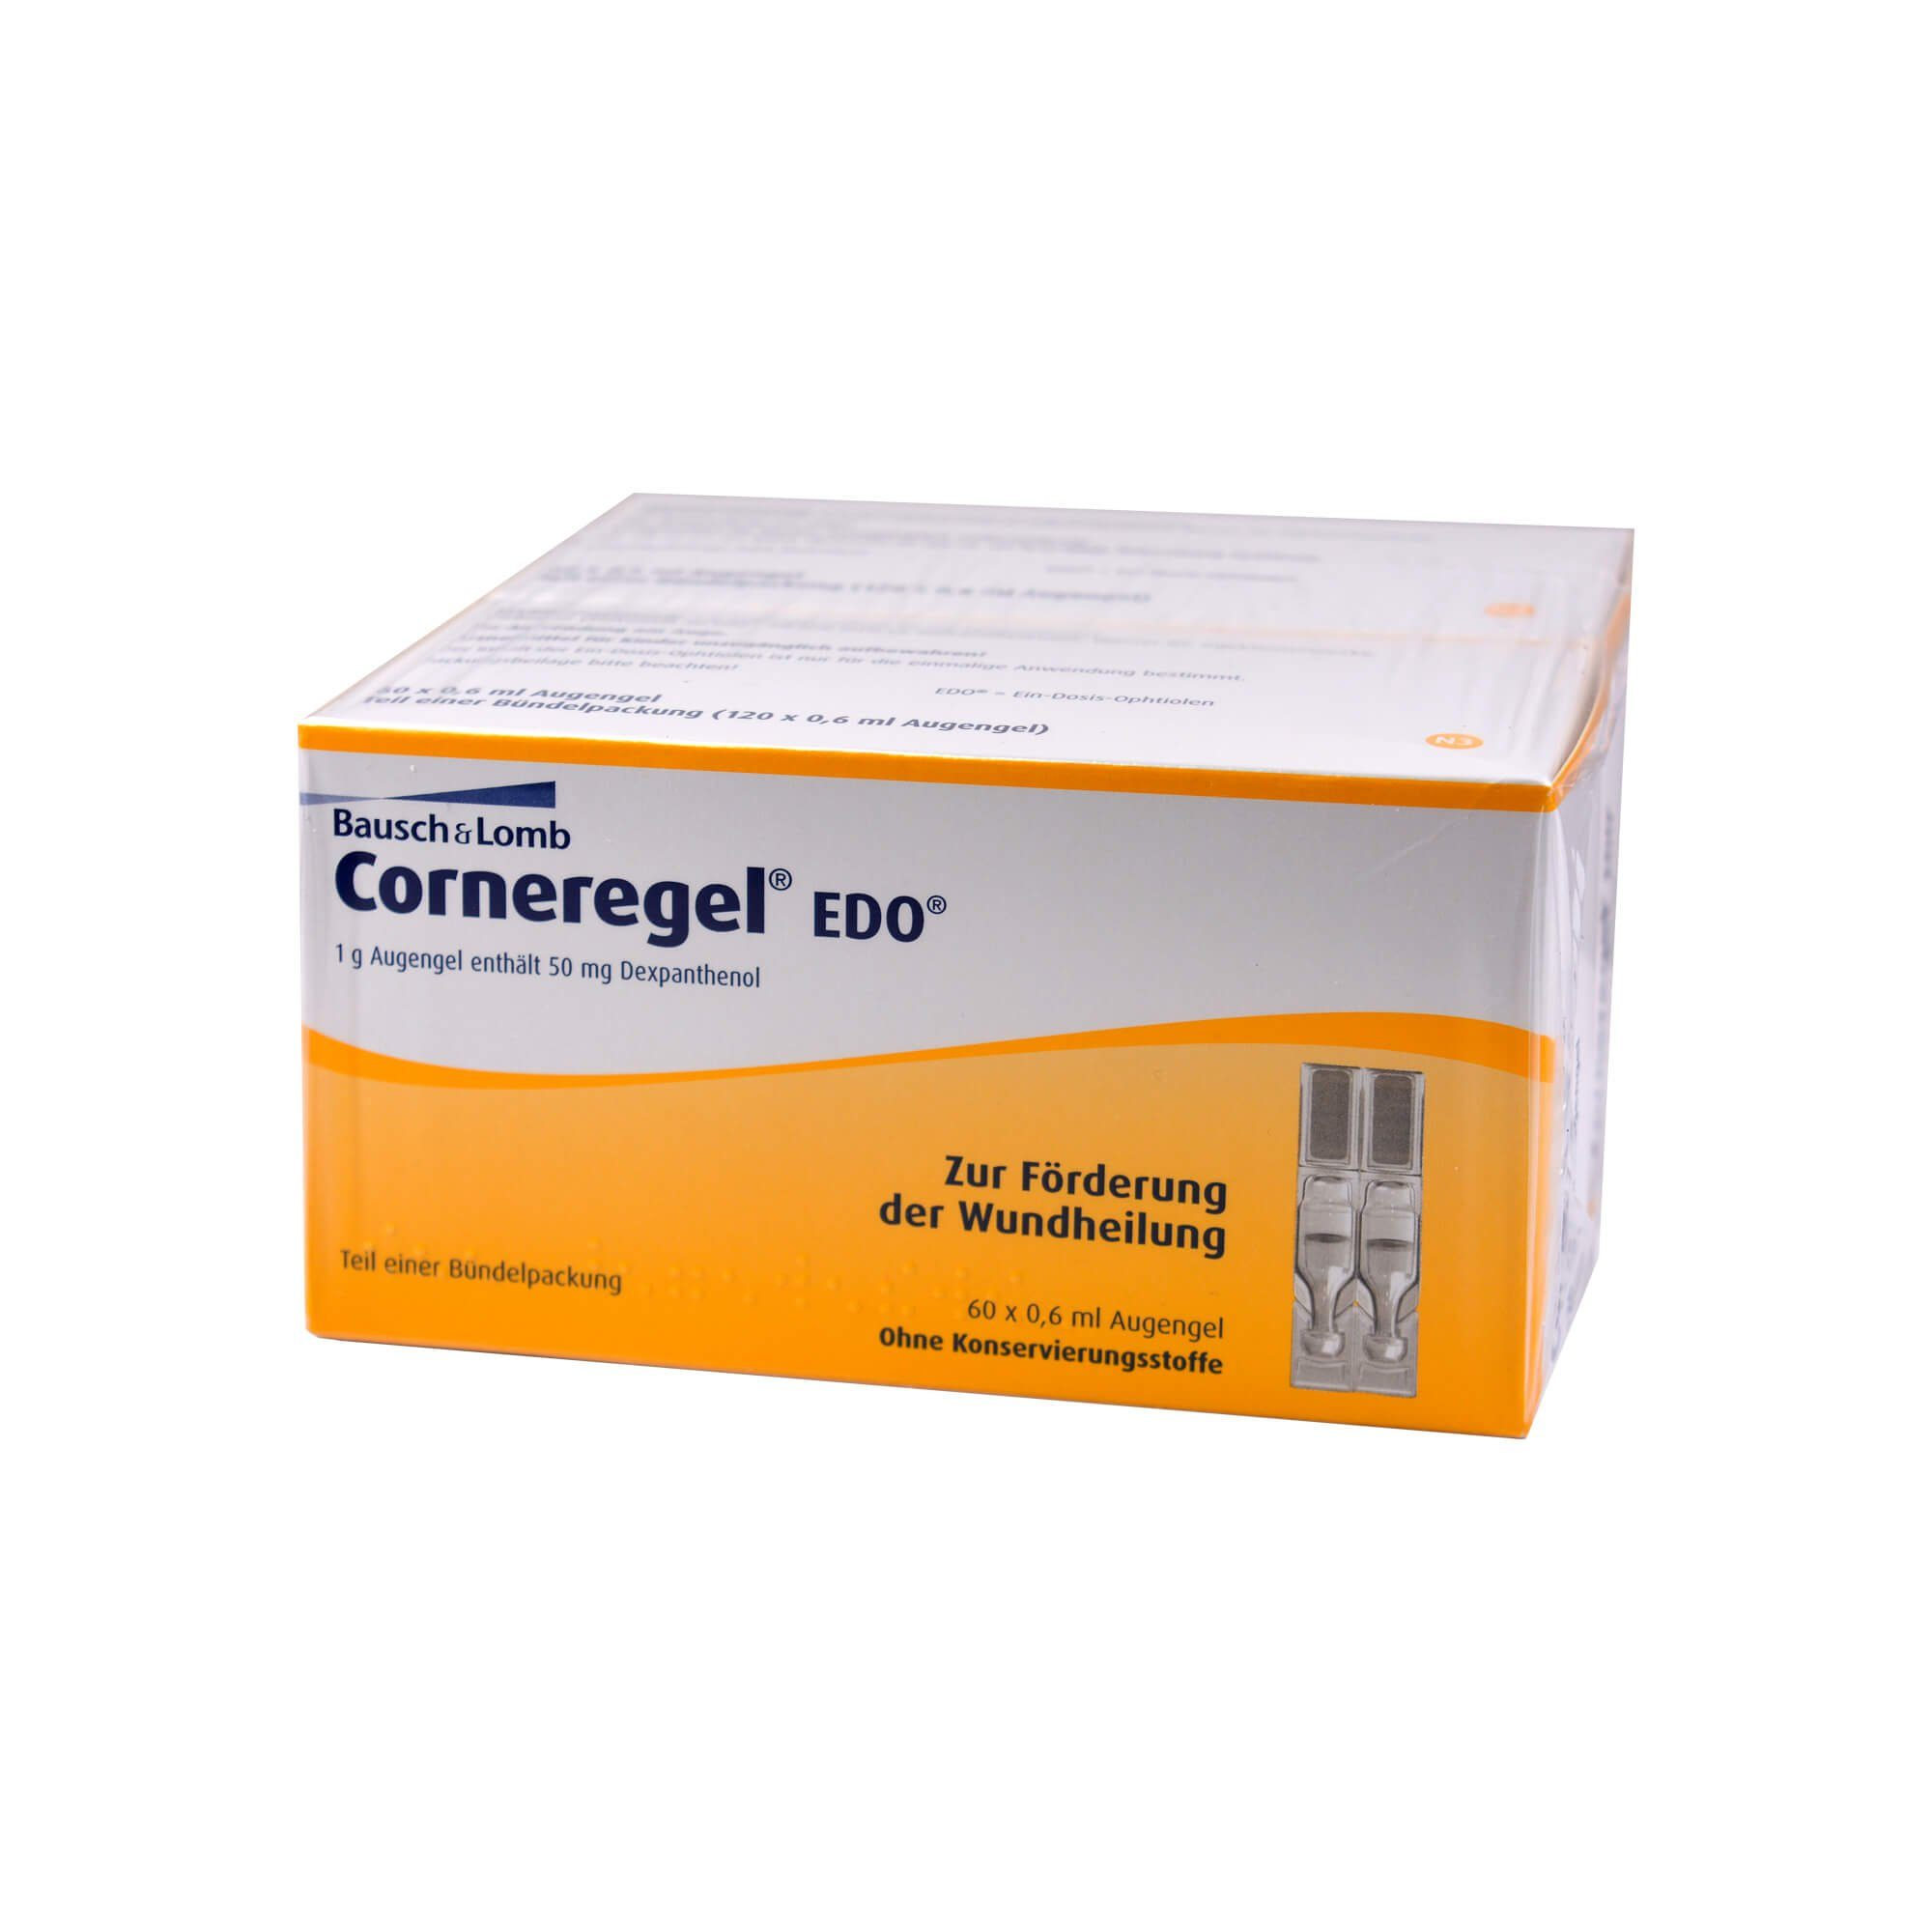 Corneregel EDO Augengel , 120X0.6 ml